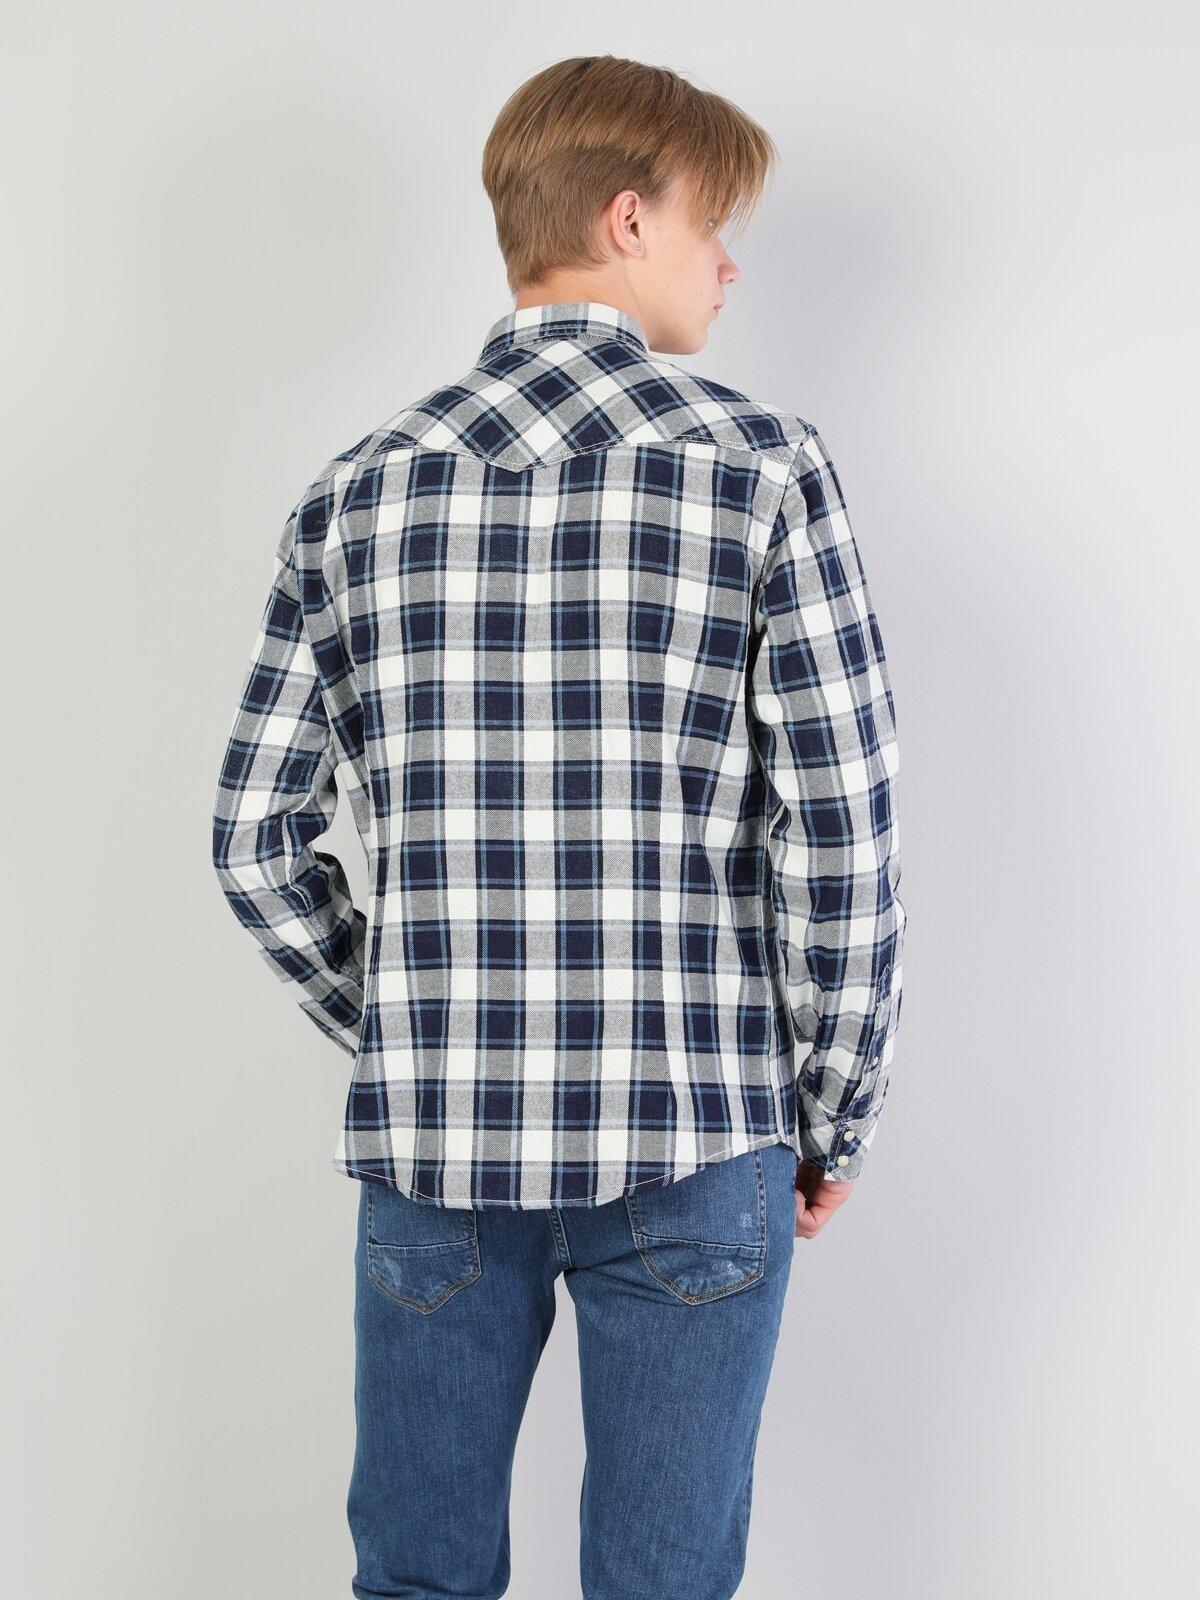 Slim Fit Shirt Neck Erkek İndigo Uzun Kol Gömlek